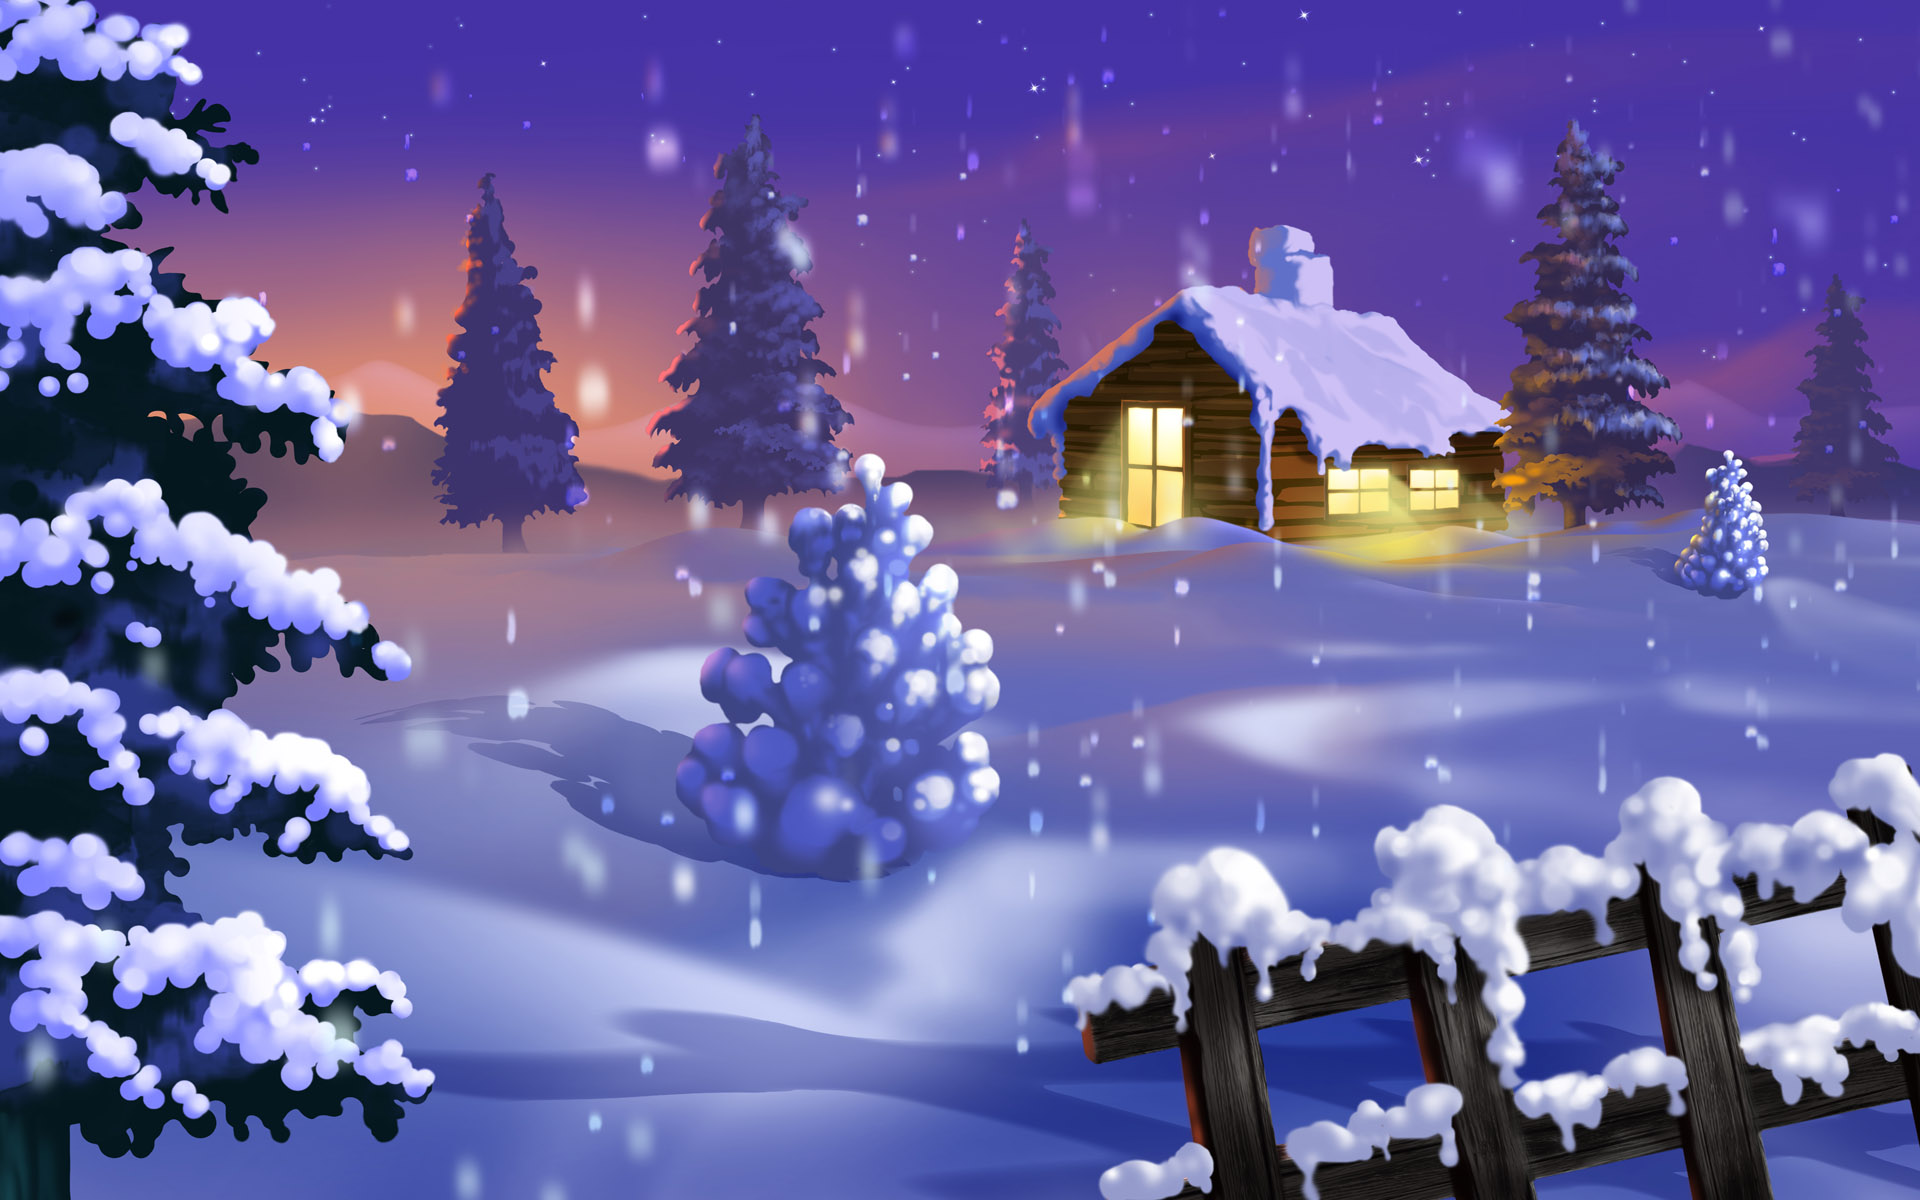 49] Winter Christmas Wallpaper on WallpaperSafari 1920x1200